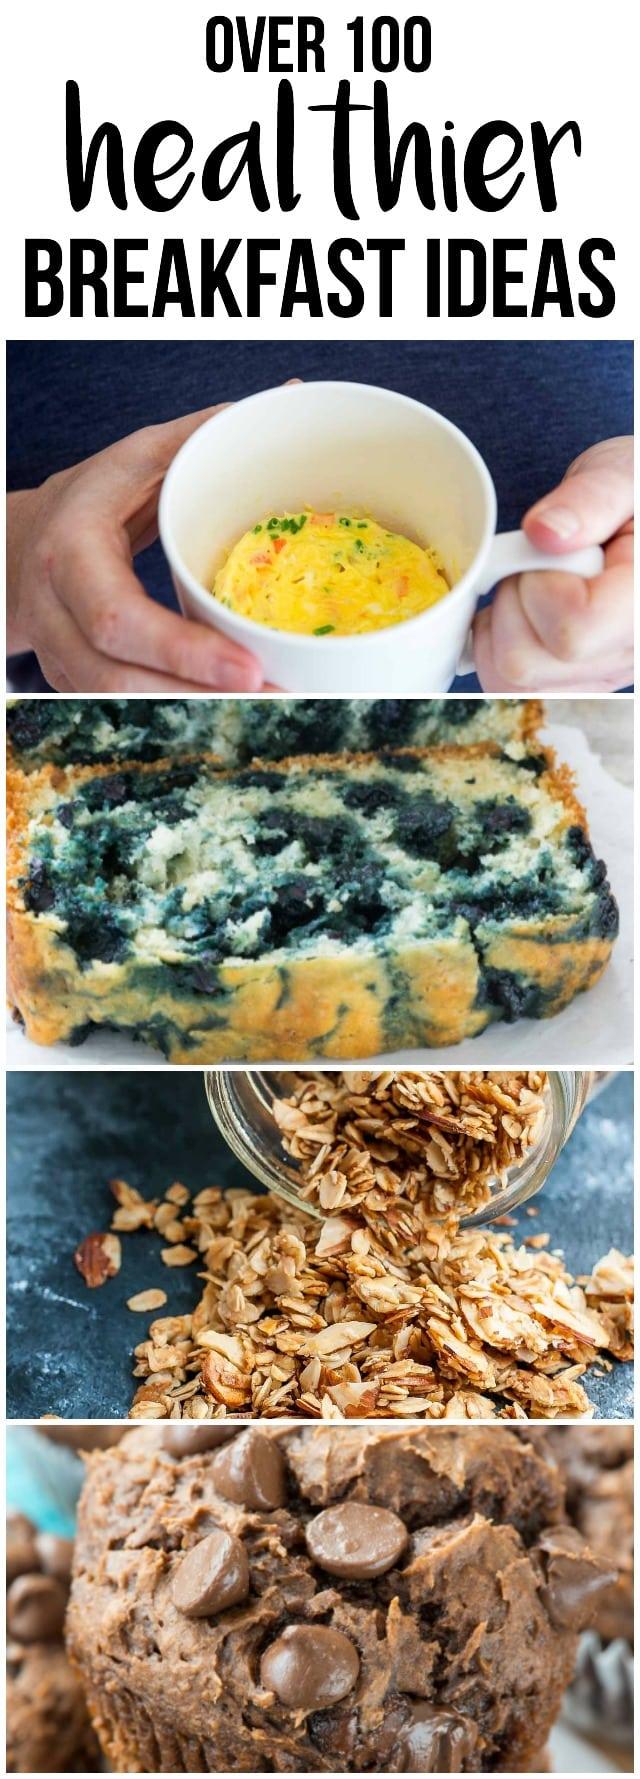 collage showing 4 skinny breakfast ideas